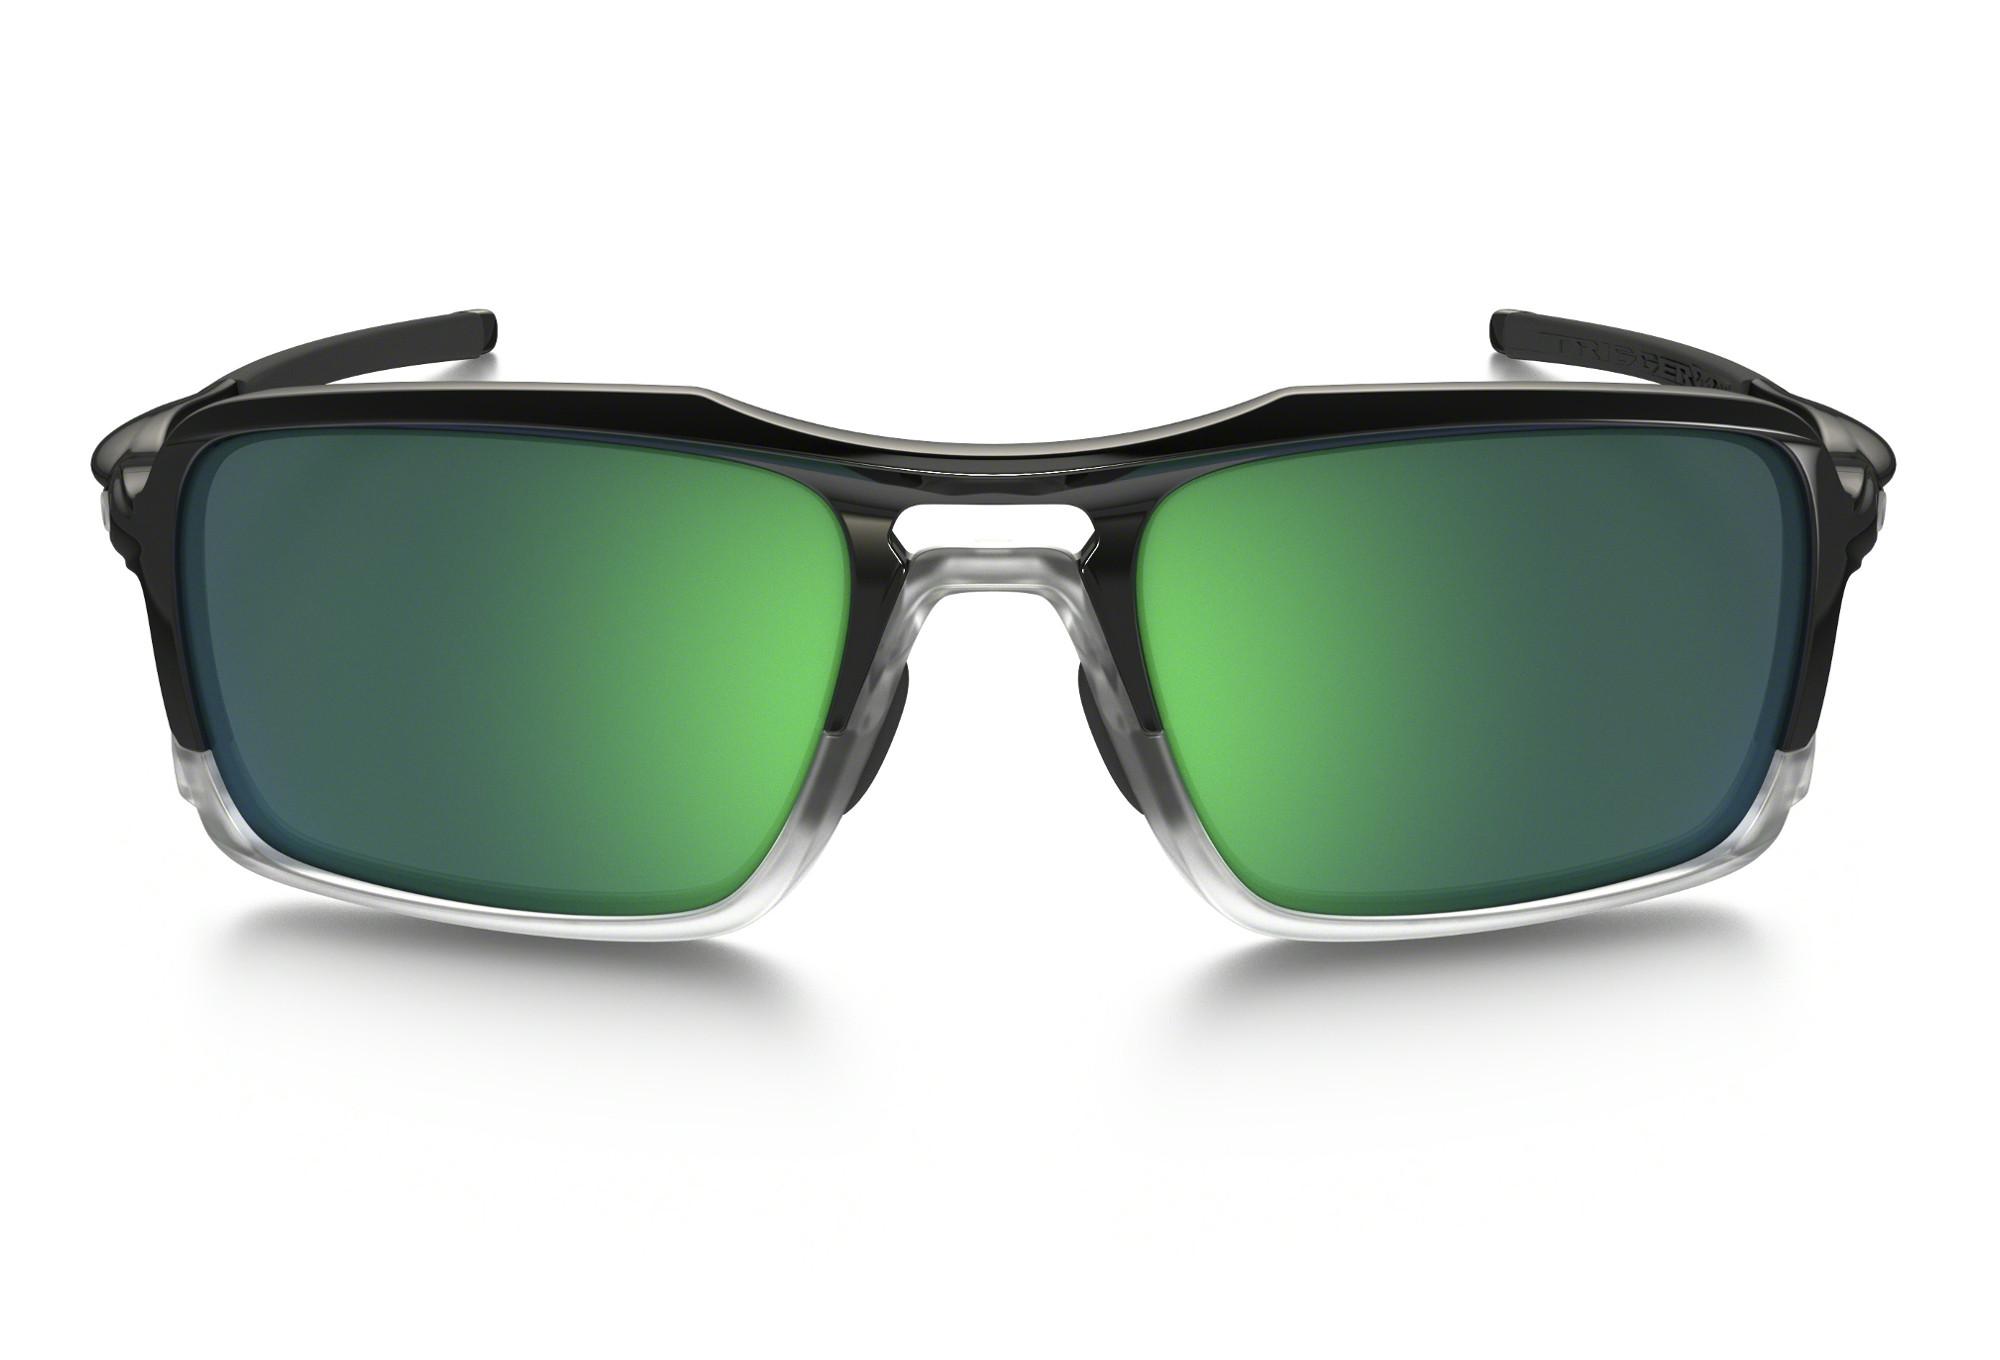 b9a8f8ba8f6e2 Gafas Oakley TRIGGERMAN black green Iridium   Miroir OO9266-02 ...